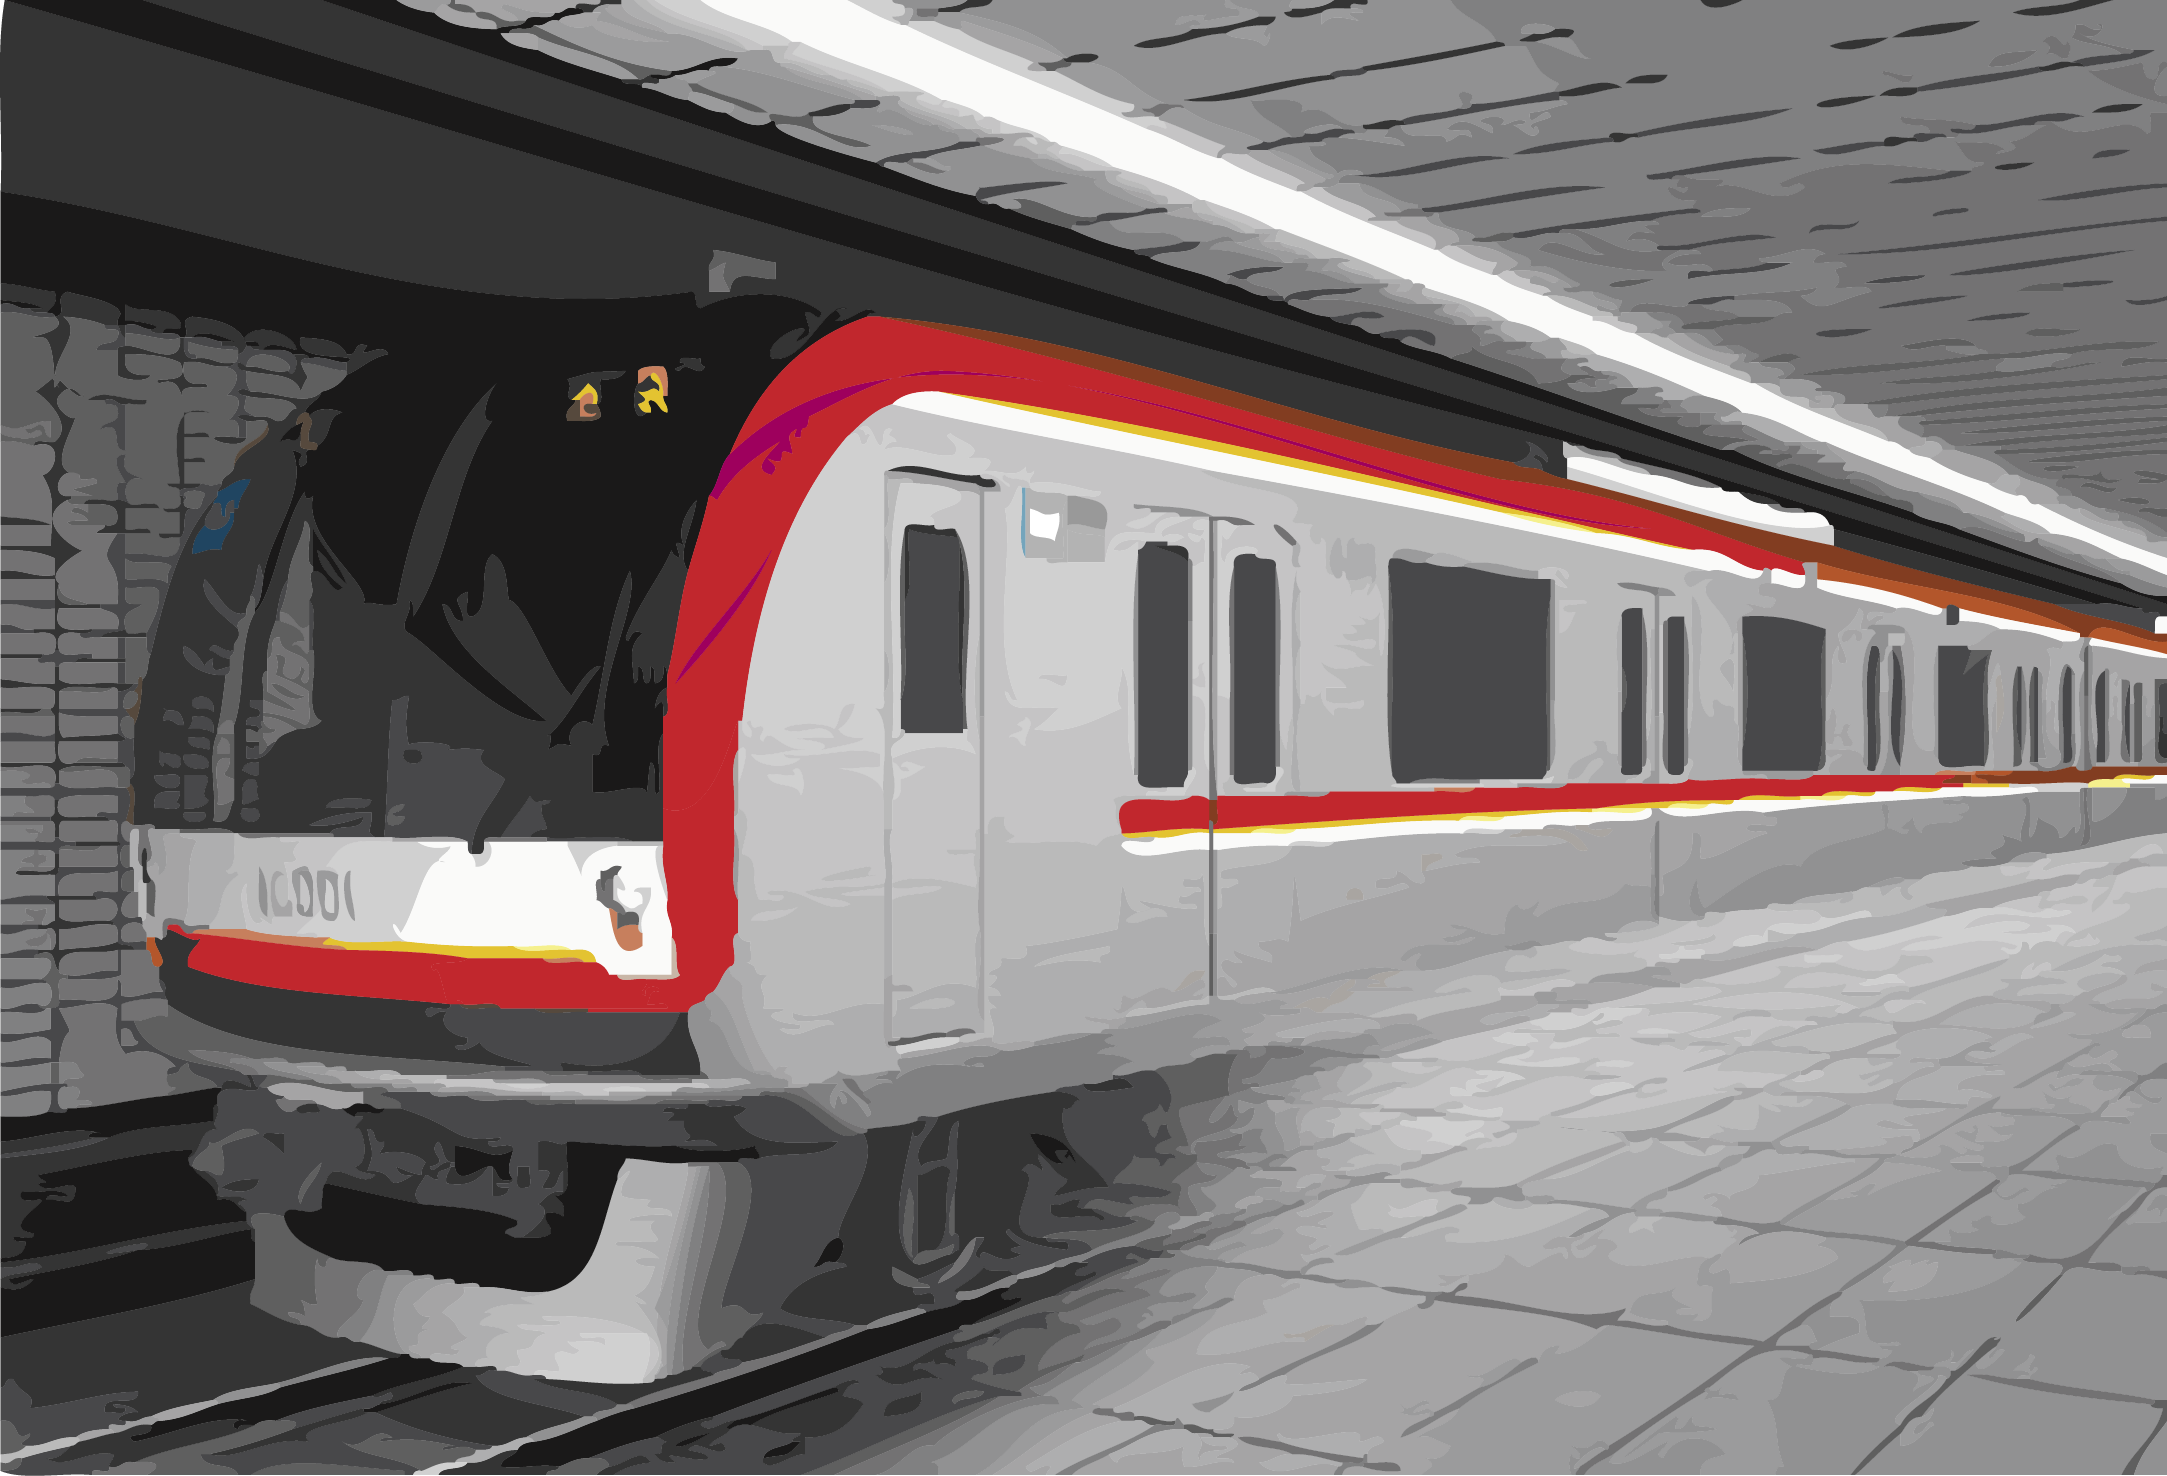 File:Line 9 (Metro Manila Subway) train.png.